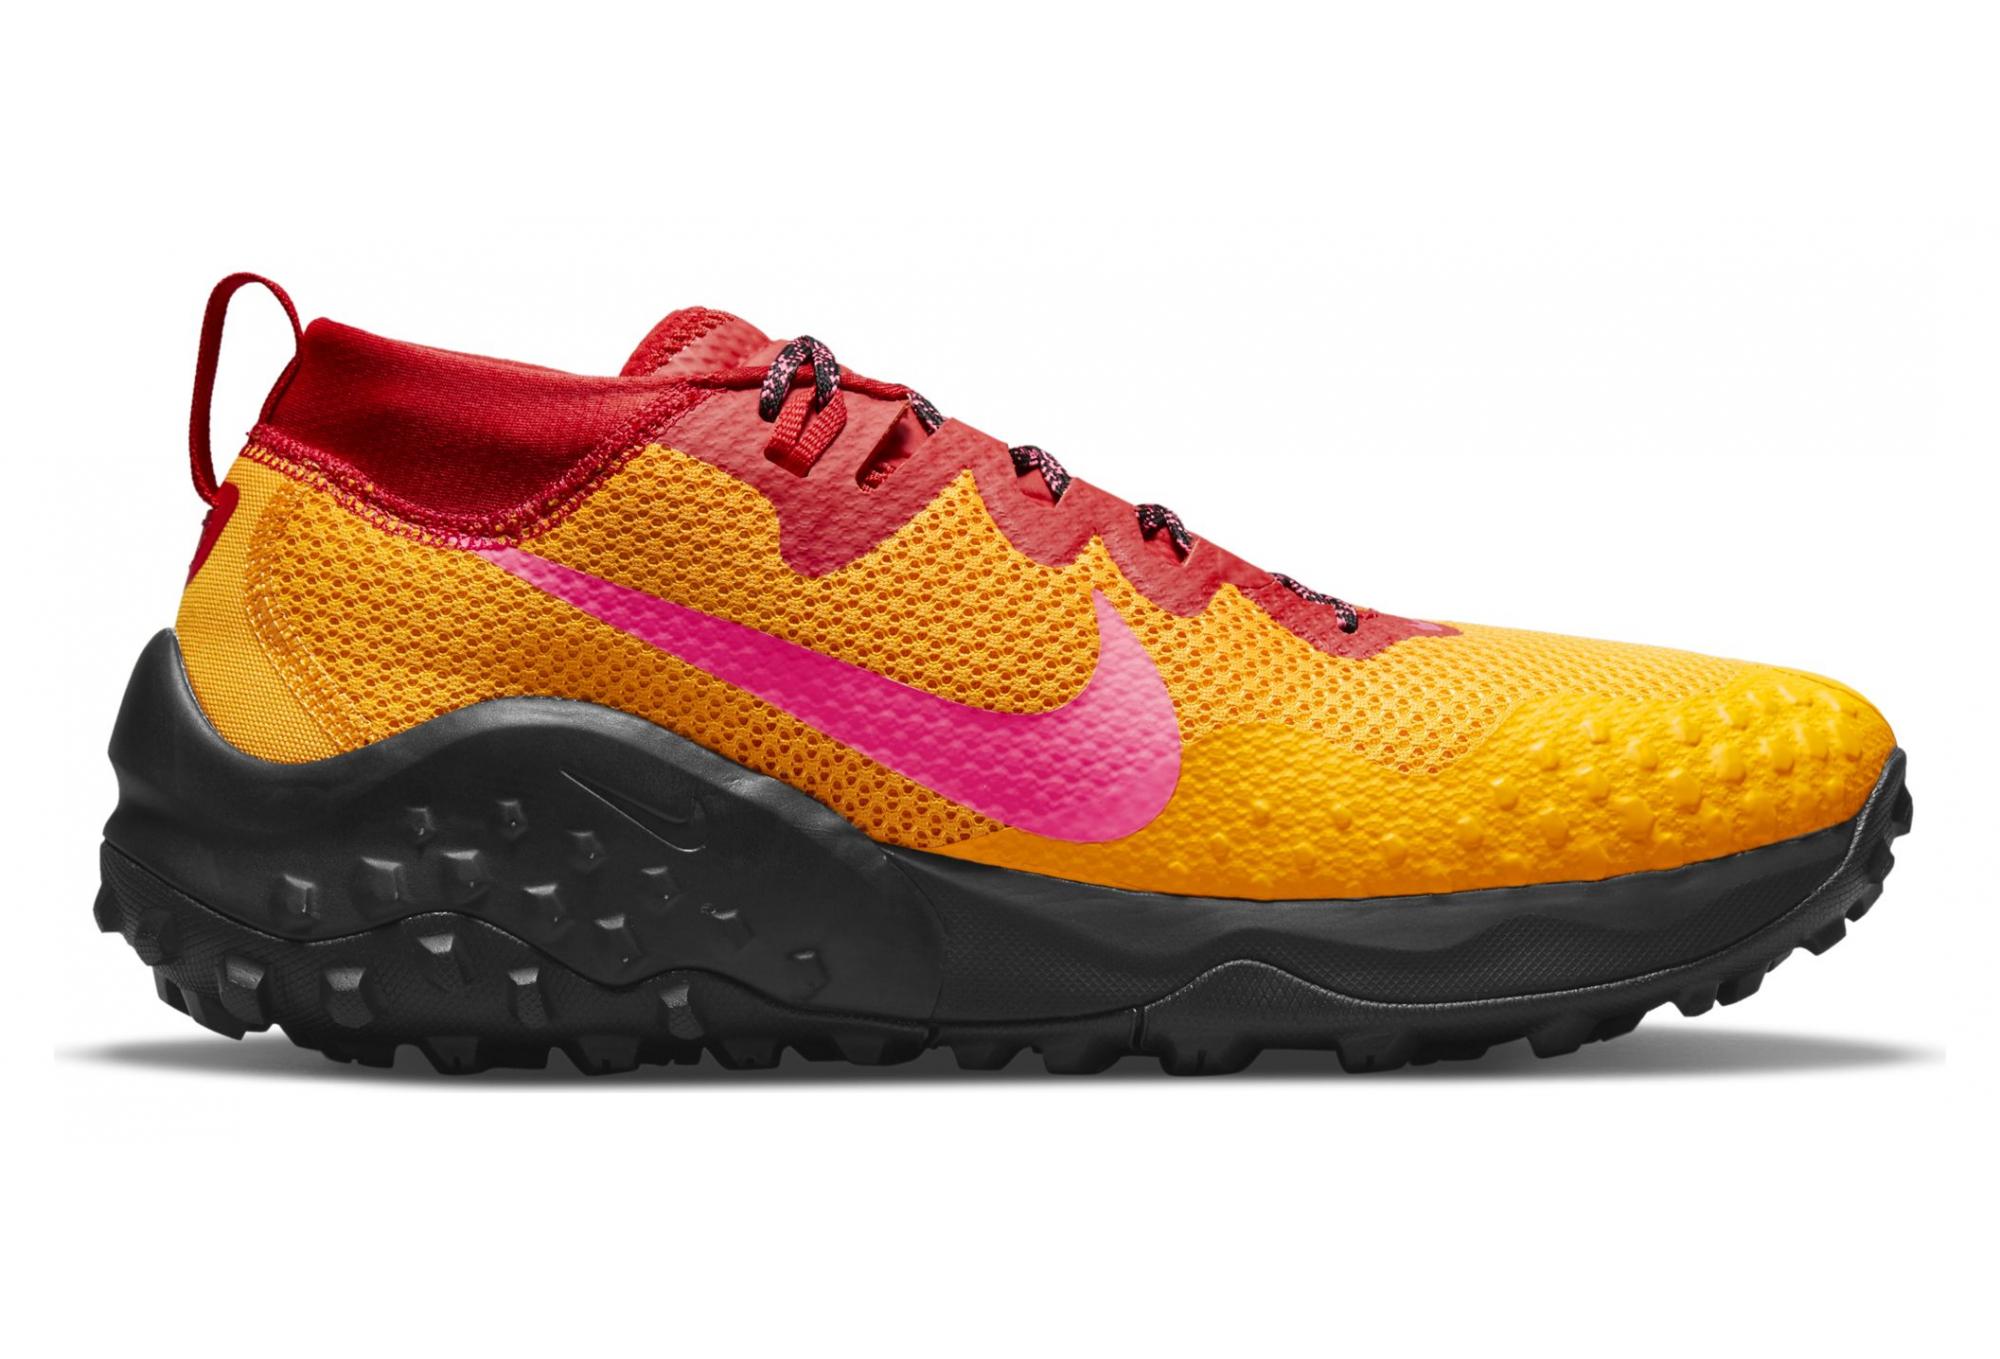 Pair of Nike Wildhorse 7 Trail Shoes Yellow / Orange / Pink Unisex ...